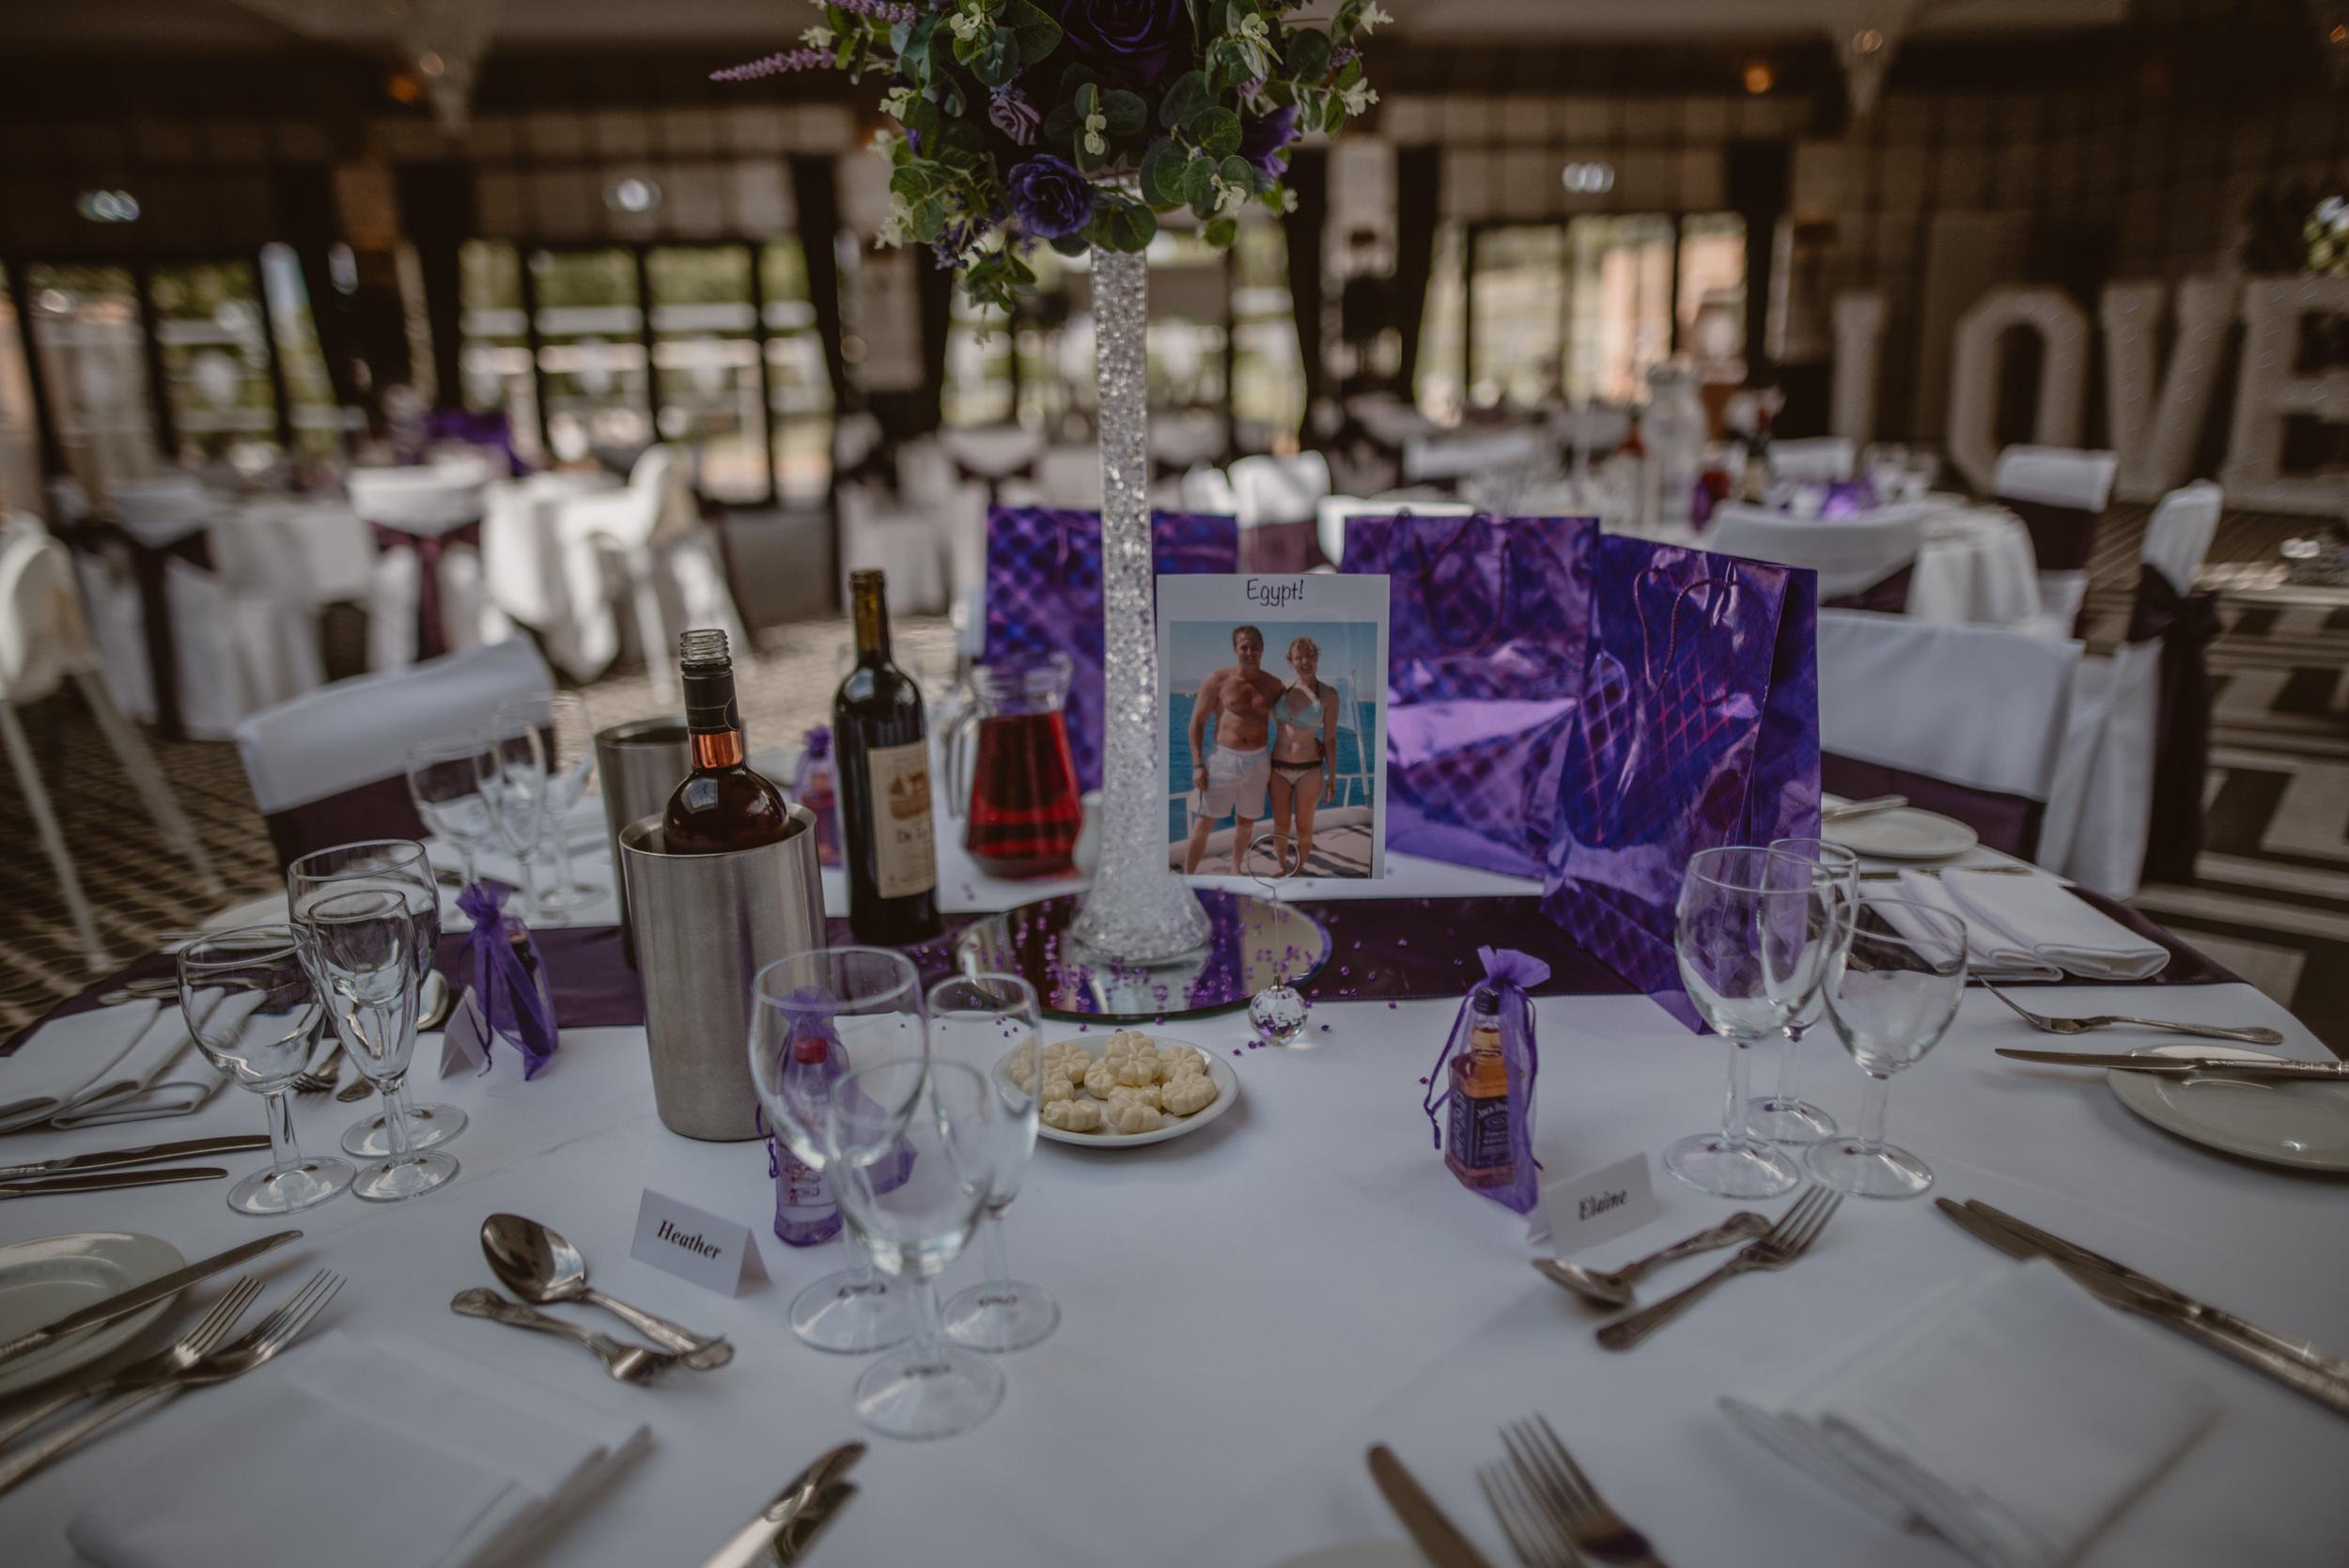 Chantelle-and-Stephen-Old-Thorns-Hotel-Wedding-Liphook-Manu-Mendoza-Wedding-Photography-320.jpg